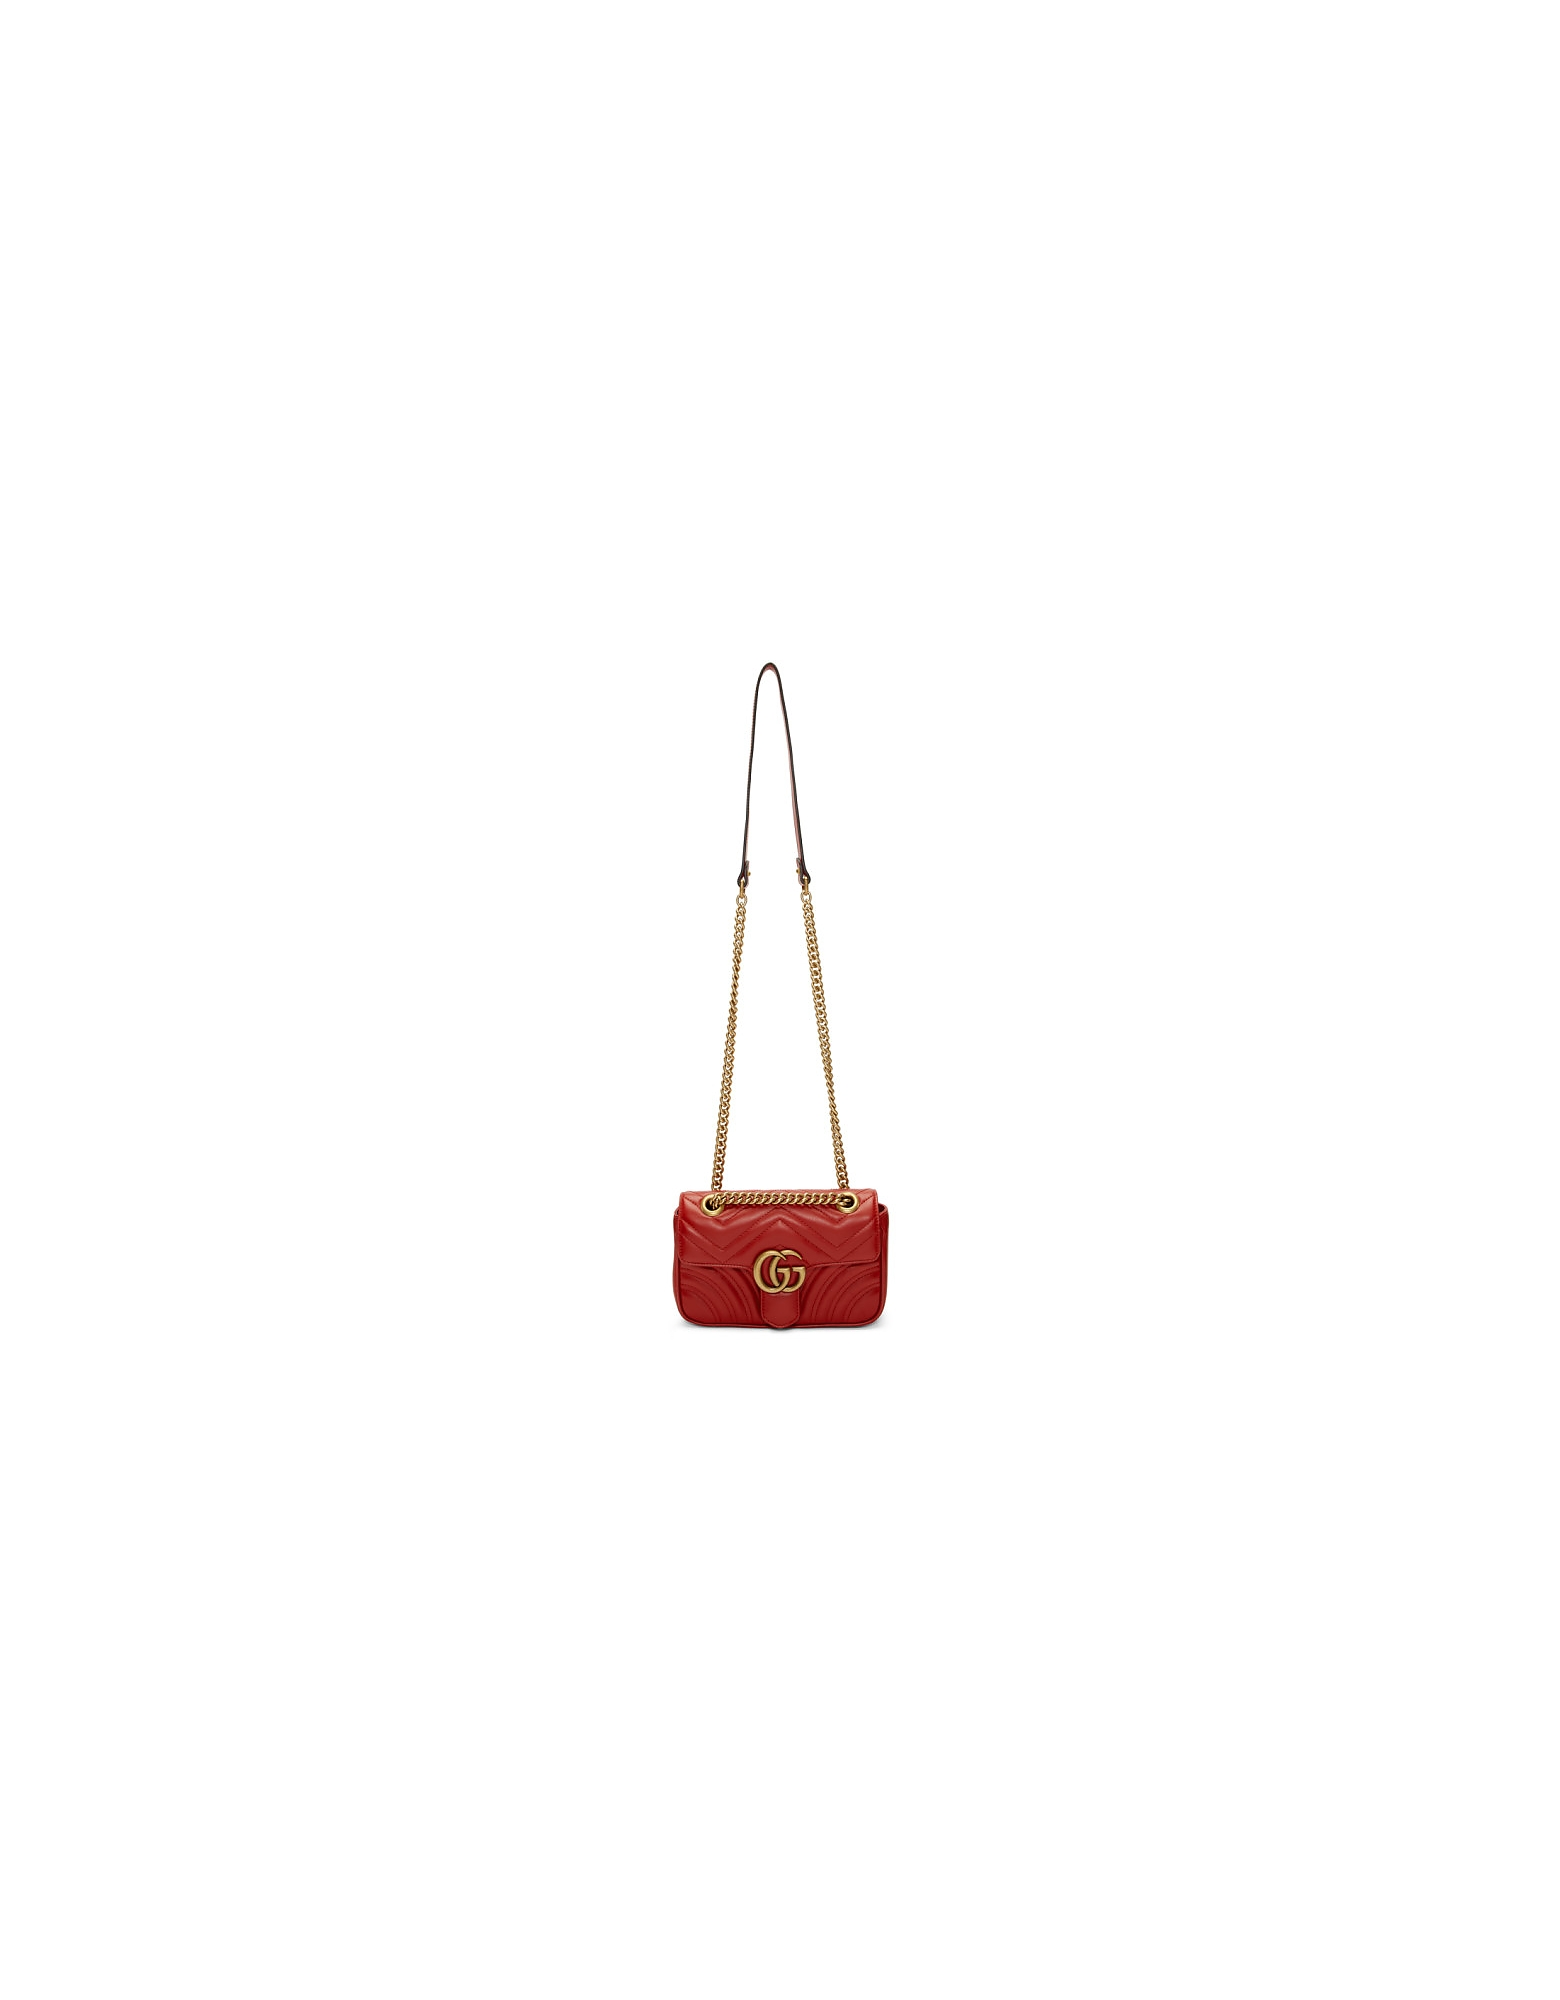 Gucci Designer Handbags, Red Mini GG Marmont 2.0 Shoulder Bag